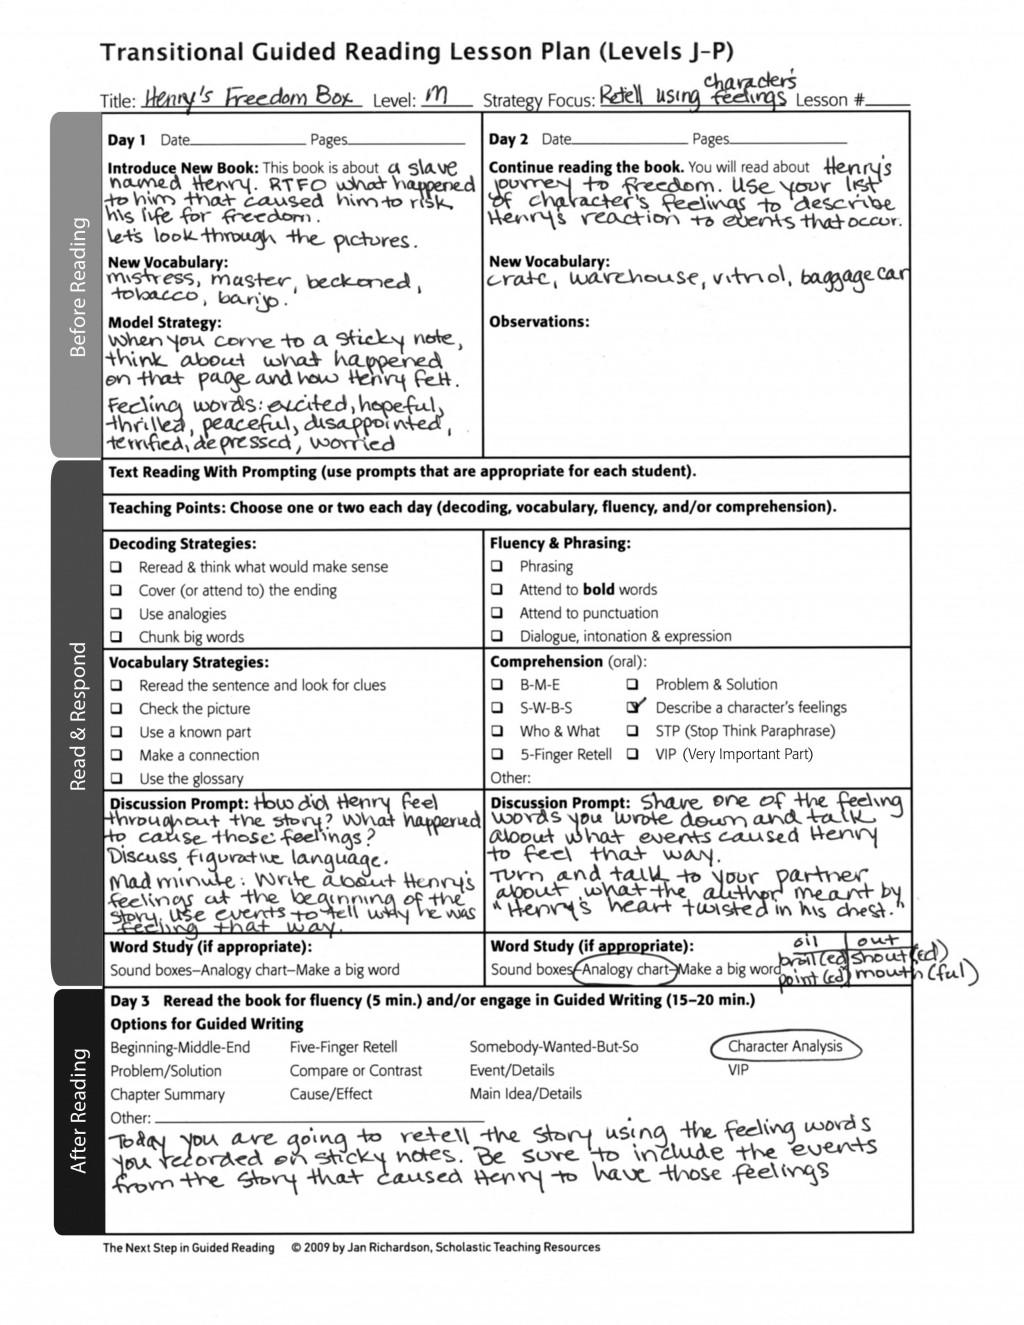 003 William Faulkner Essays Essay Example Bank Comparison Worksheet Fresh Model English Stunning Topics Large